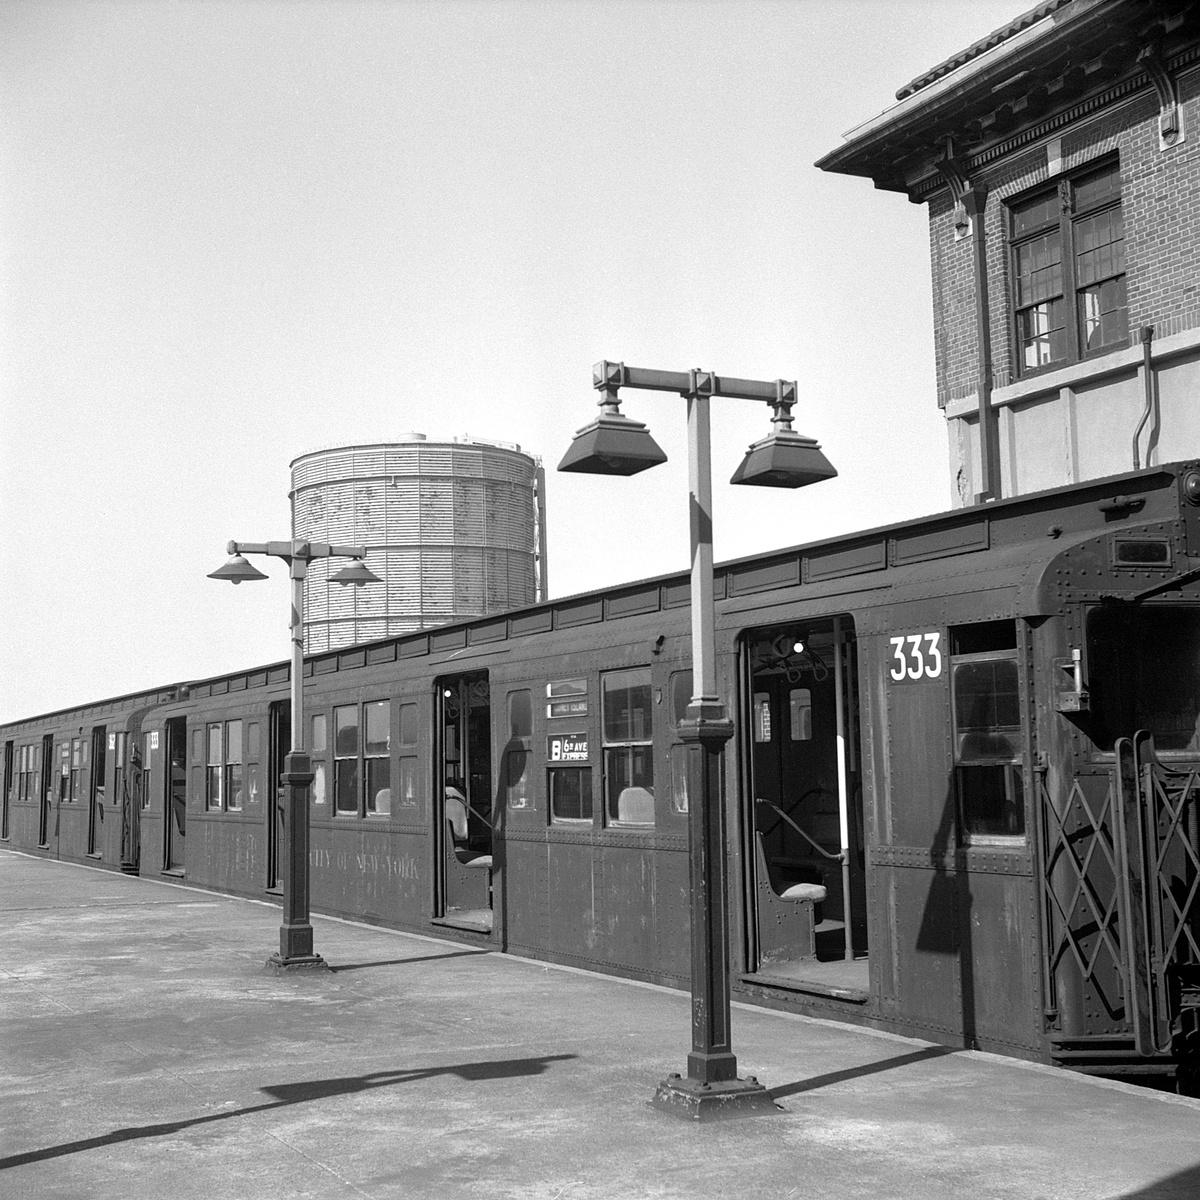 (572k, 1200x1200)<br><b>Country:</b> United States<br><b>City:</b> New York<br><b>System:</b> New York City Transit<br><b>Location:</b> Coney Island/Stillwell Avenue<br><b>Route:</b> B<br><b>Car:</b> R-1 (American Car & Foundry, 1930-1931) 333 <br><b>Collection of:</b> David Pirmann<br><b>Date:</b> 4/6/1968<br><b>Viewed (this week/total):</b> 0 / 322